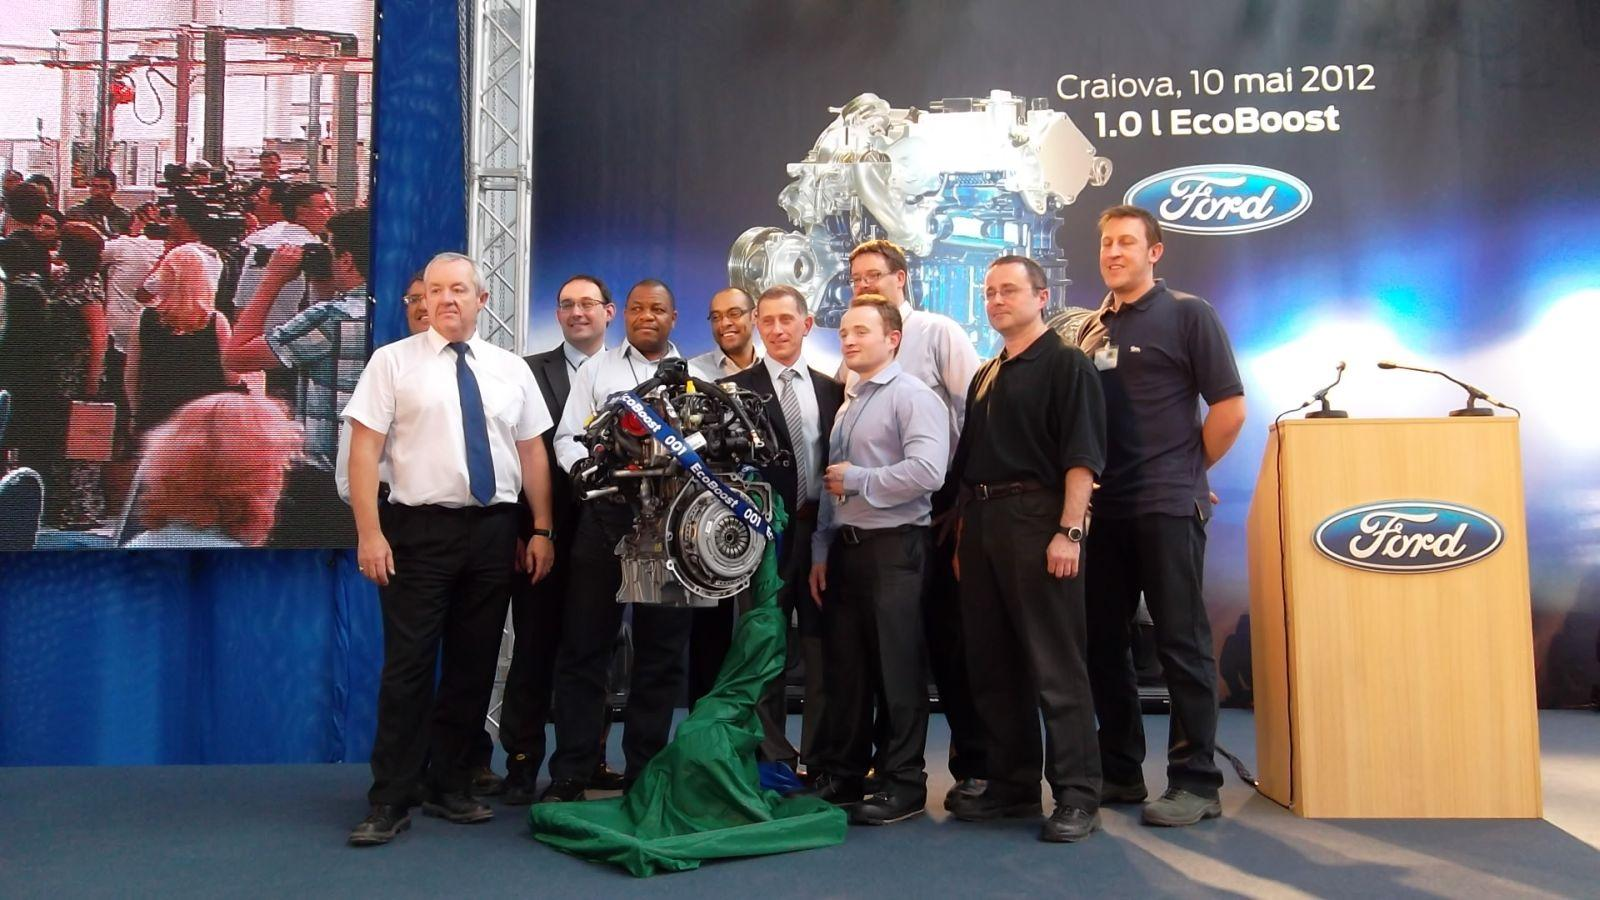 Ford da startul productiei de motoare la Craiova - Ford da startul productiei de motoare la Craiova